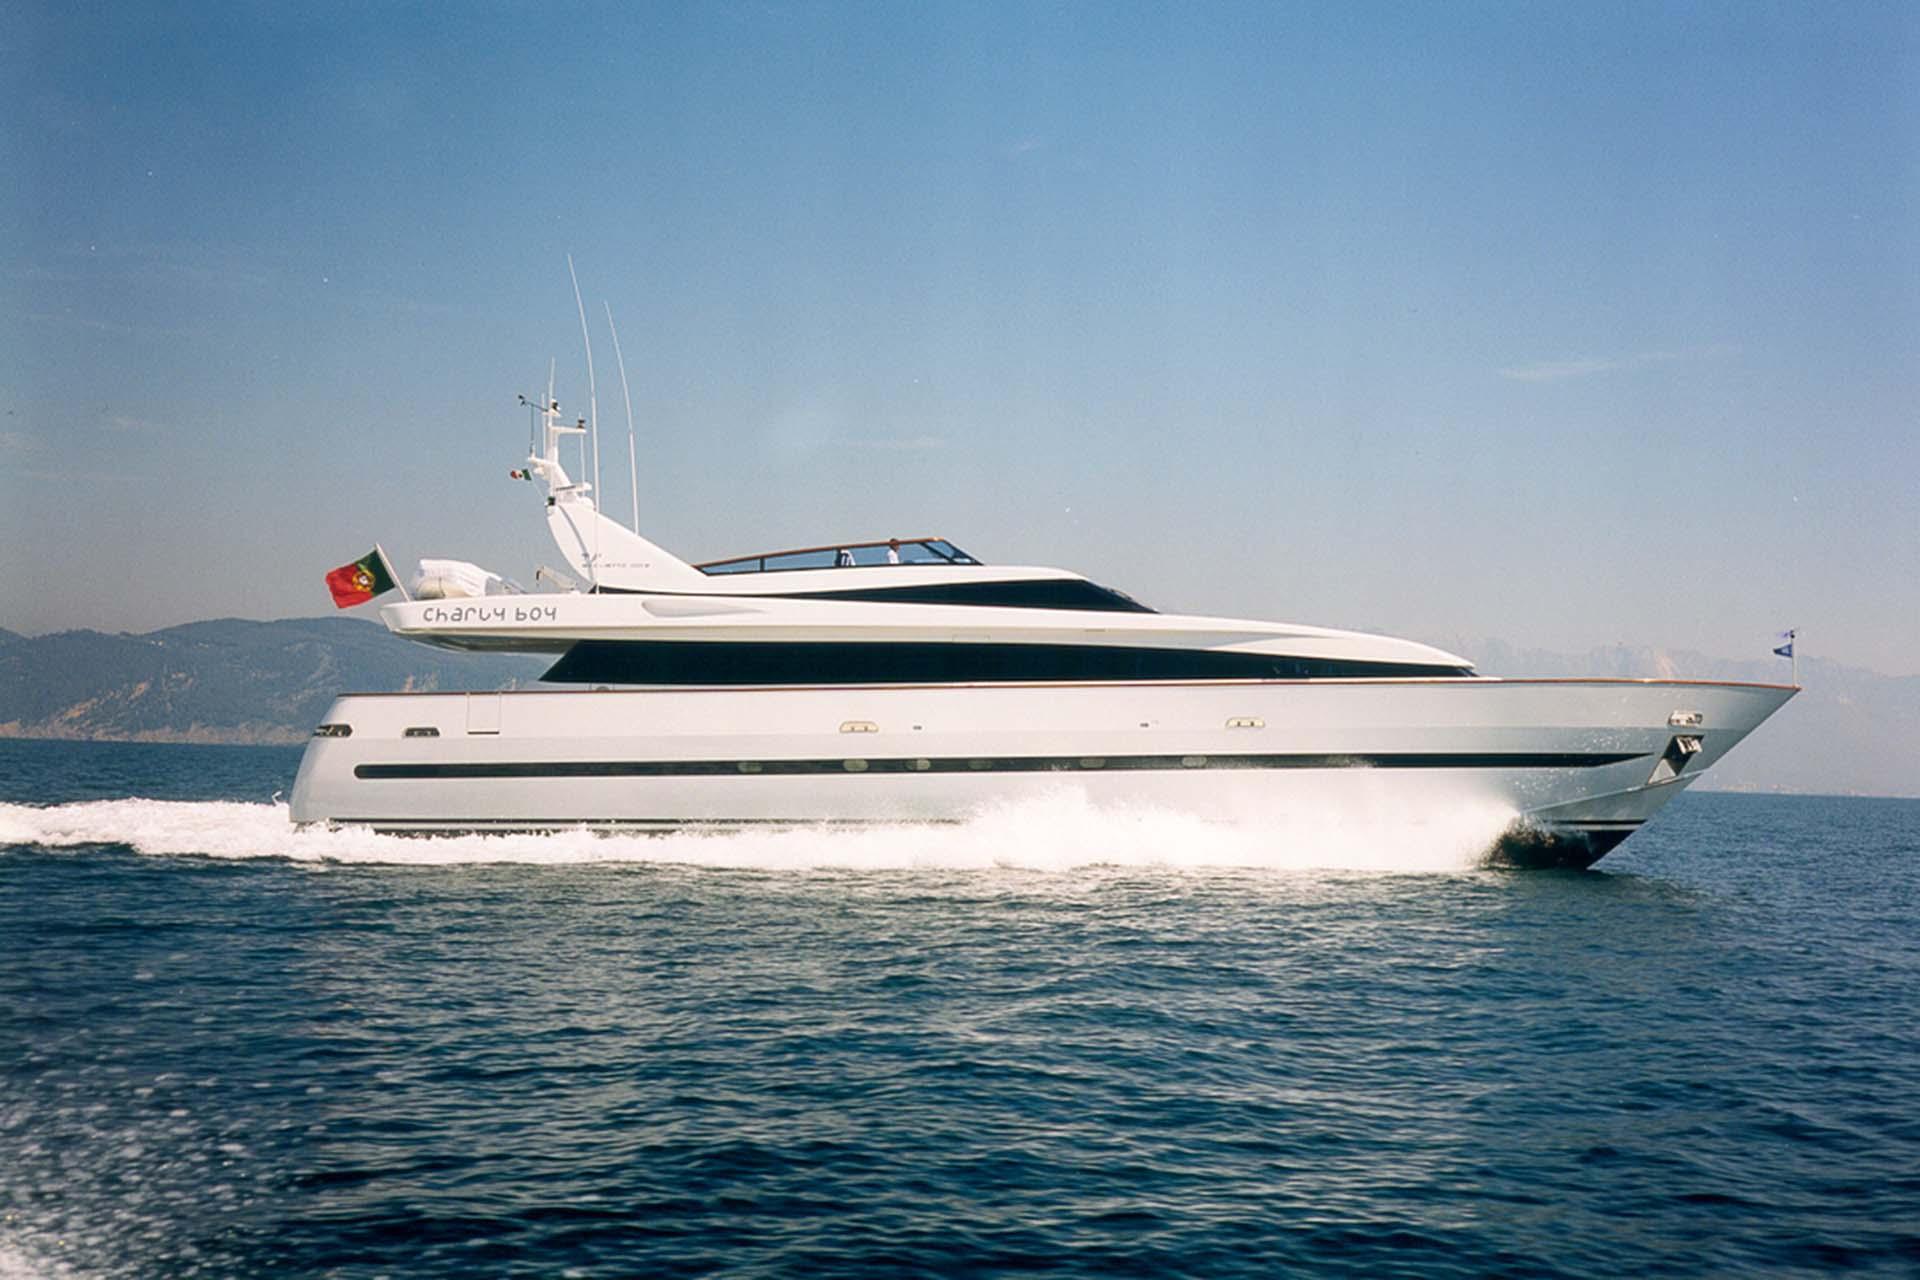 baglietto - CHARLIE BOY - Paskowsky Yacht Design